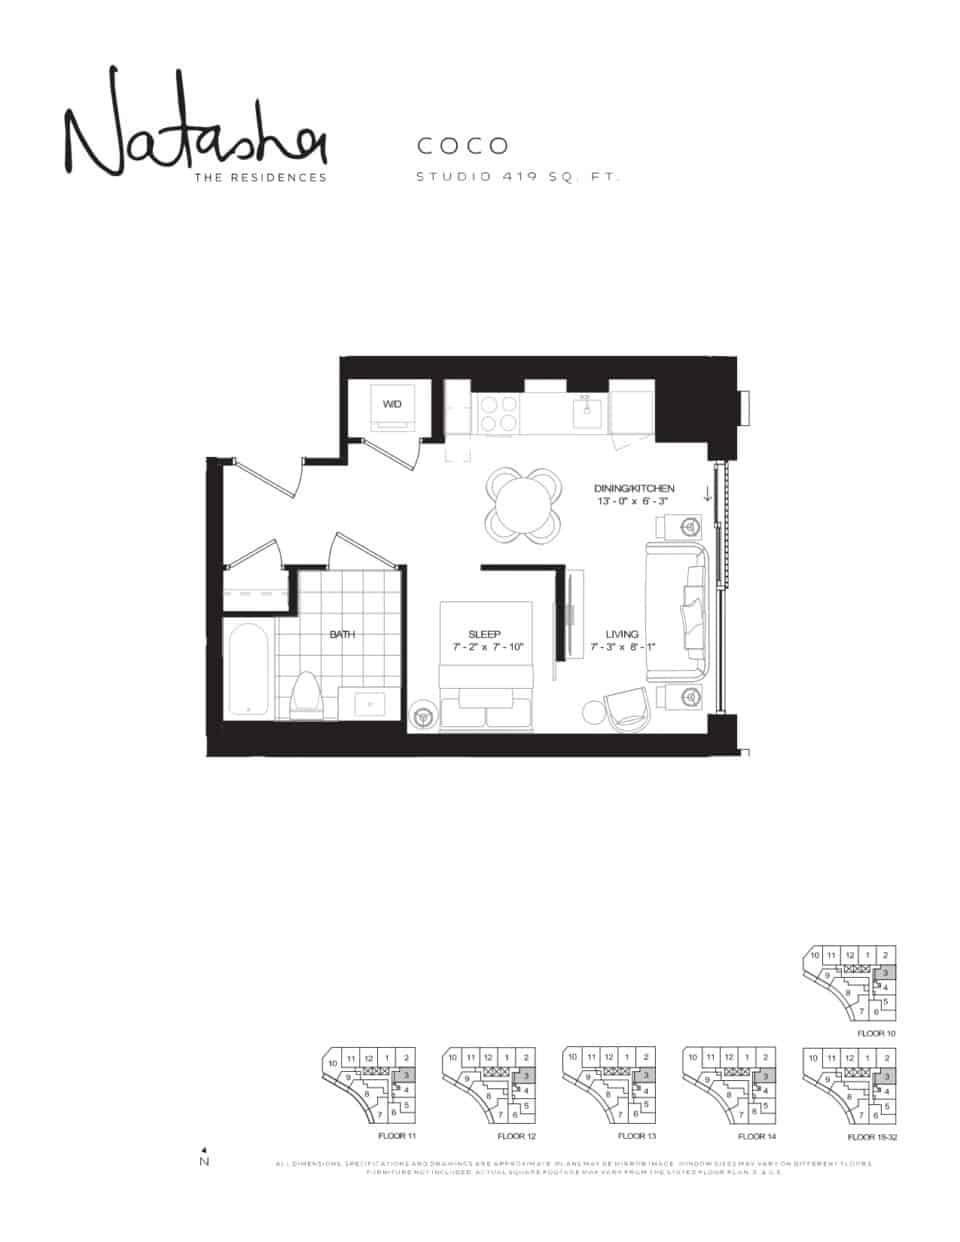 2021 09 02 11 02 06 natashatheresidences lanterradevelopments floorplans coco